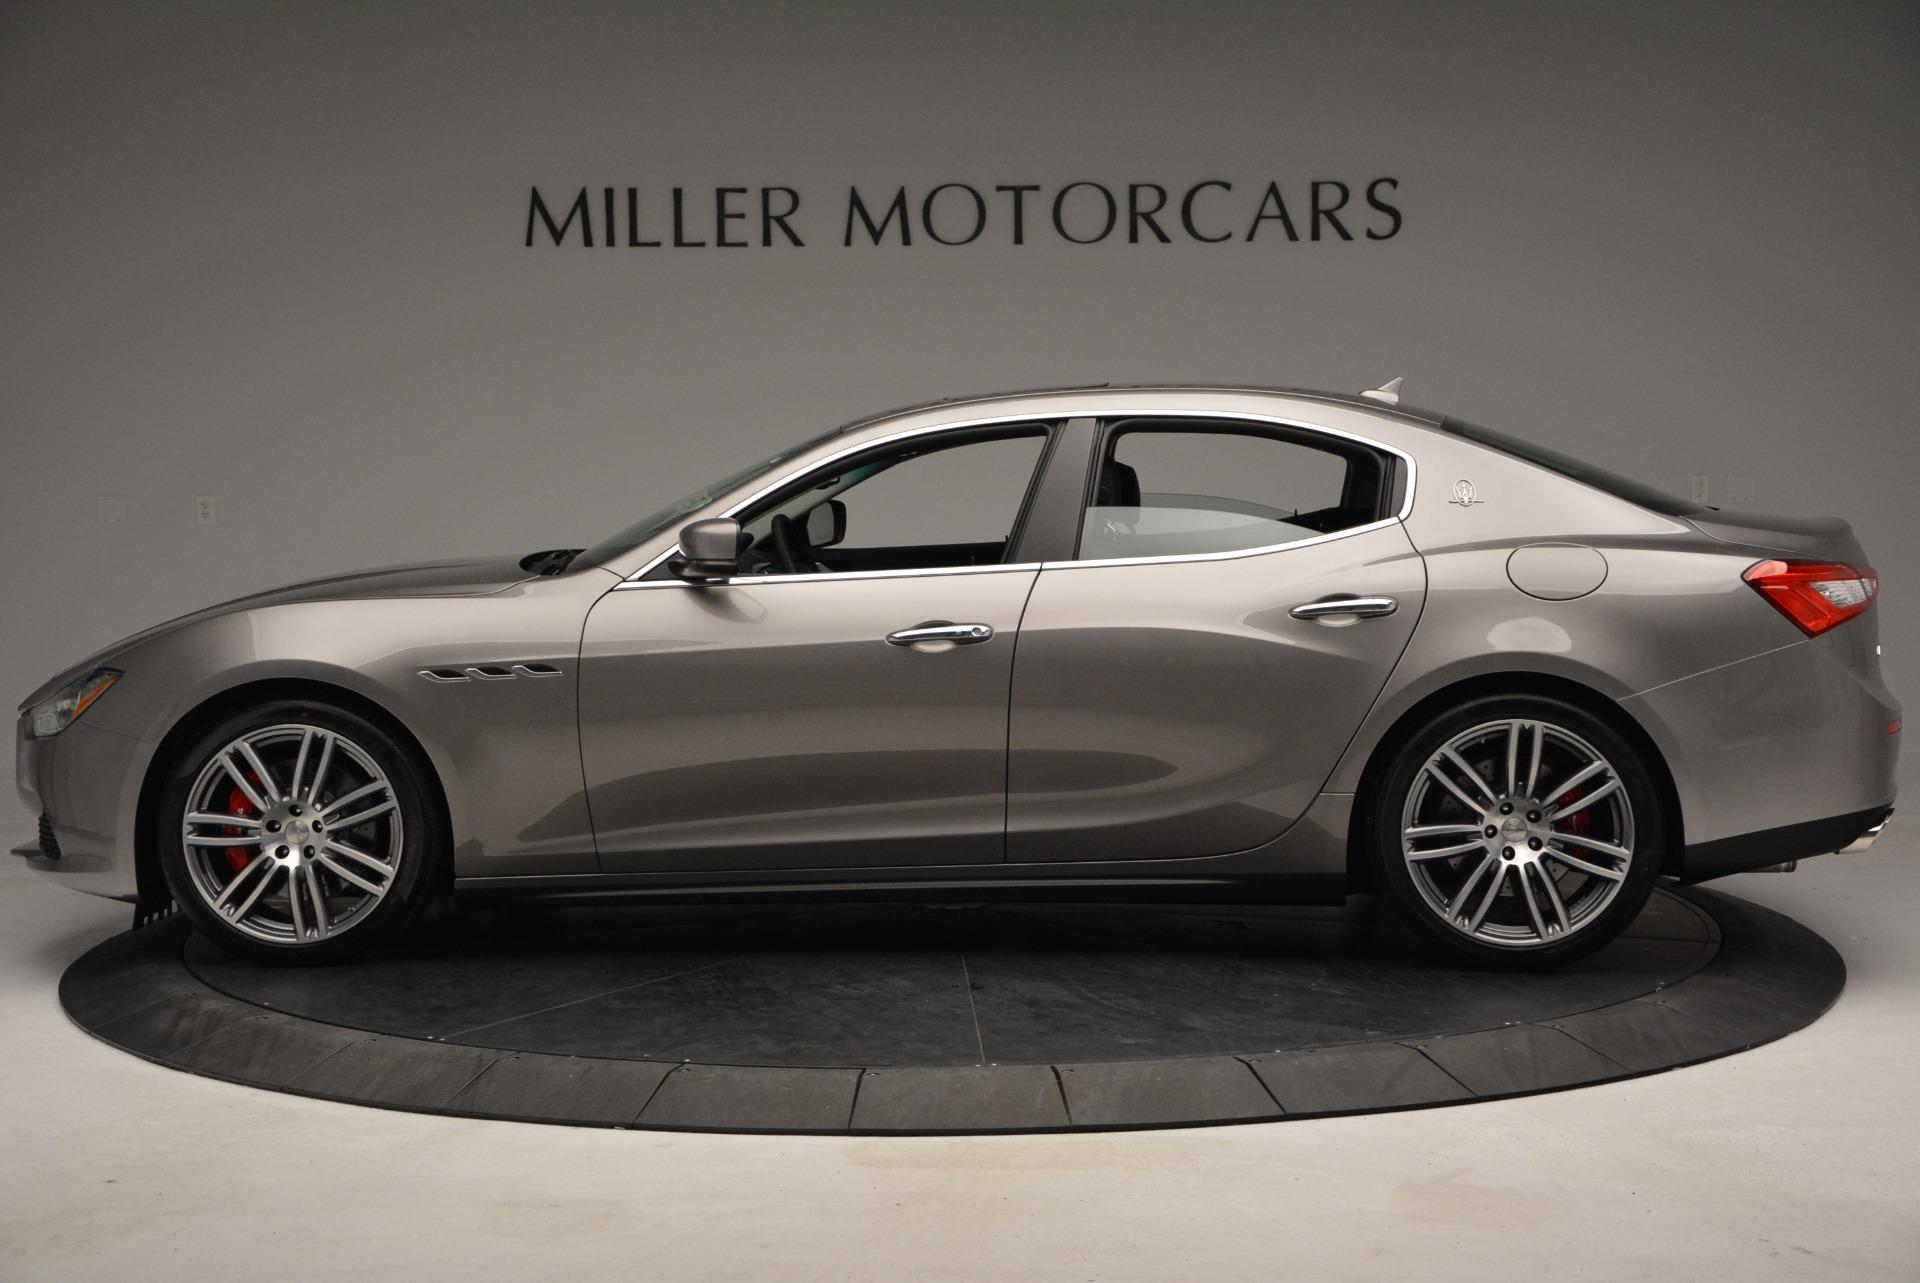 Used 2014 Maserati Ghibli S Q4 For Sale In Greenwich, CT 2562_p3